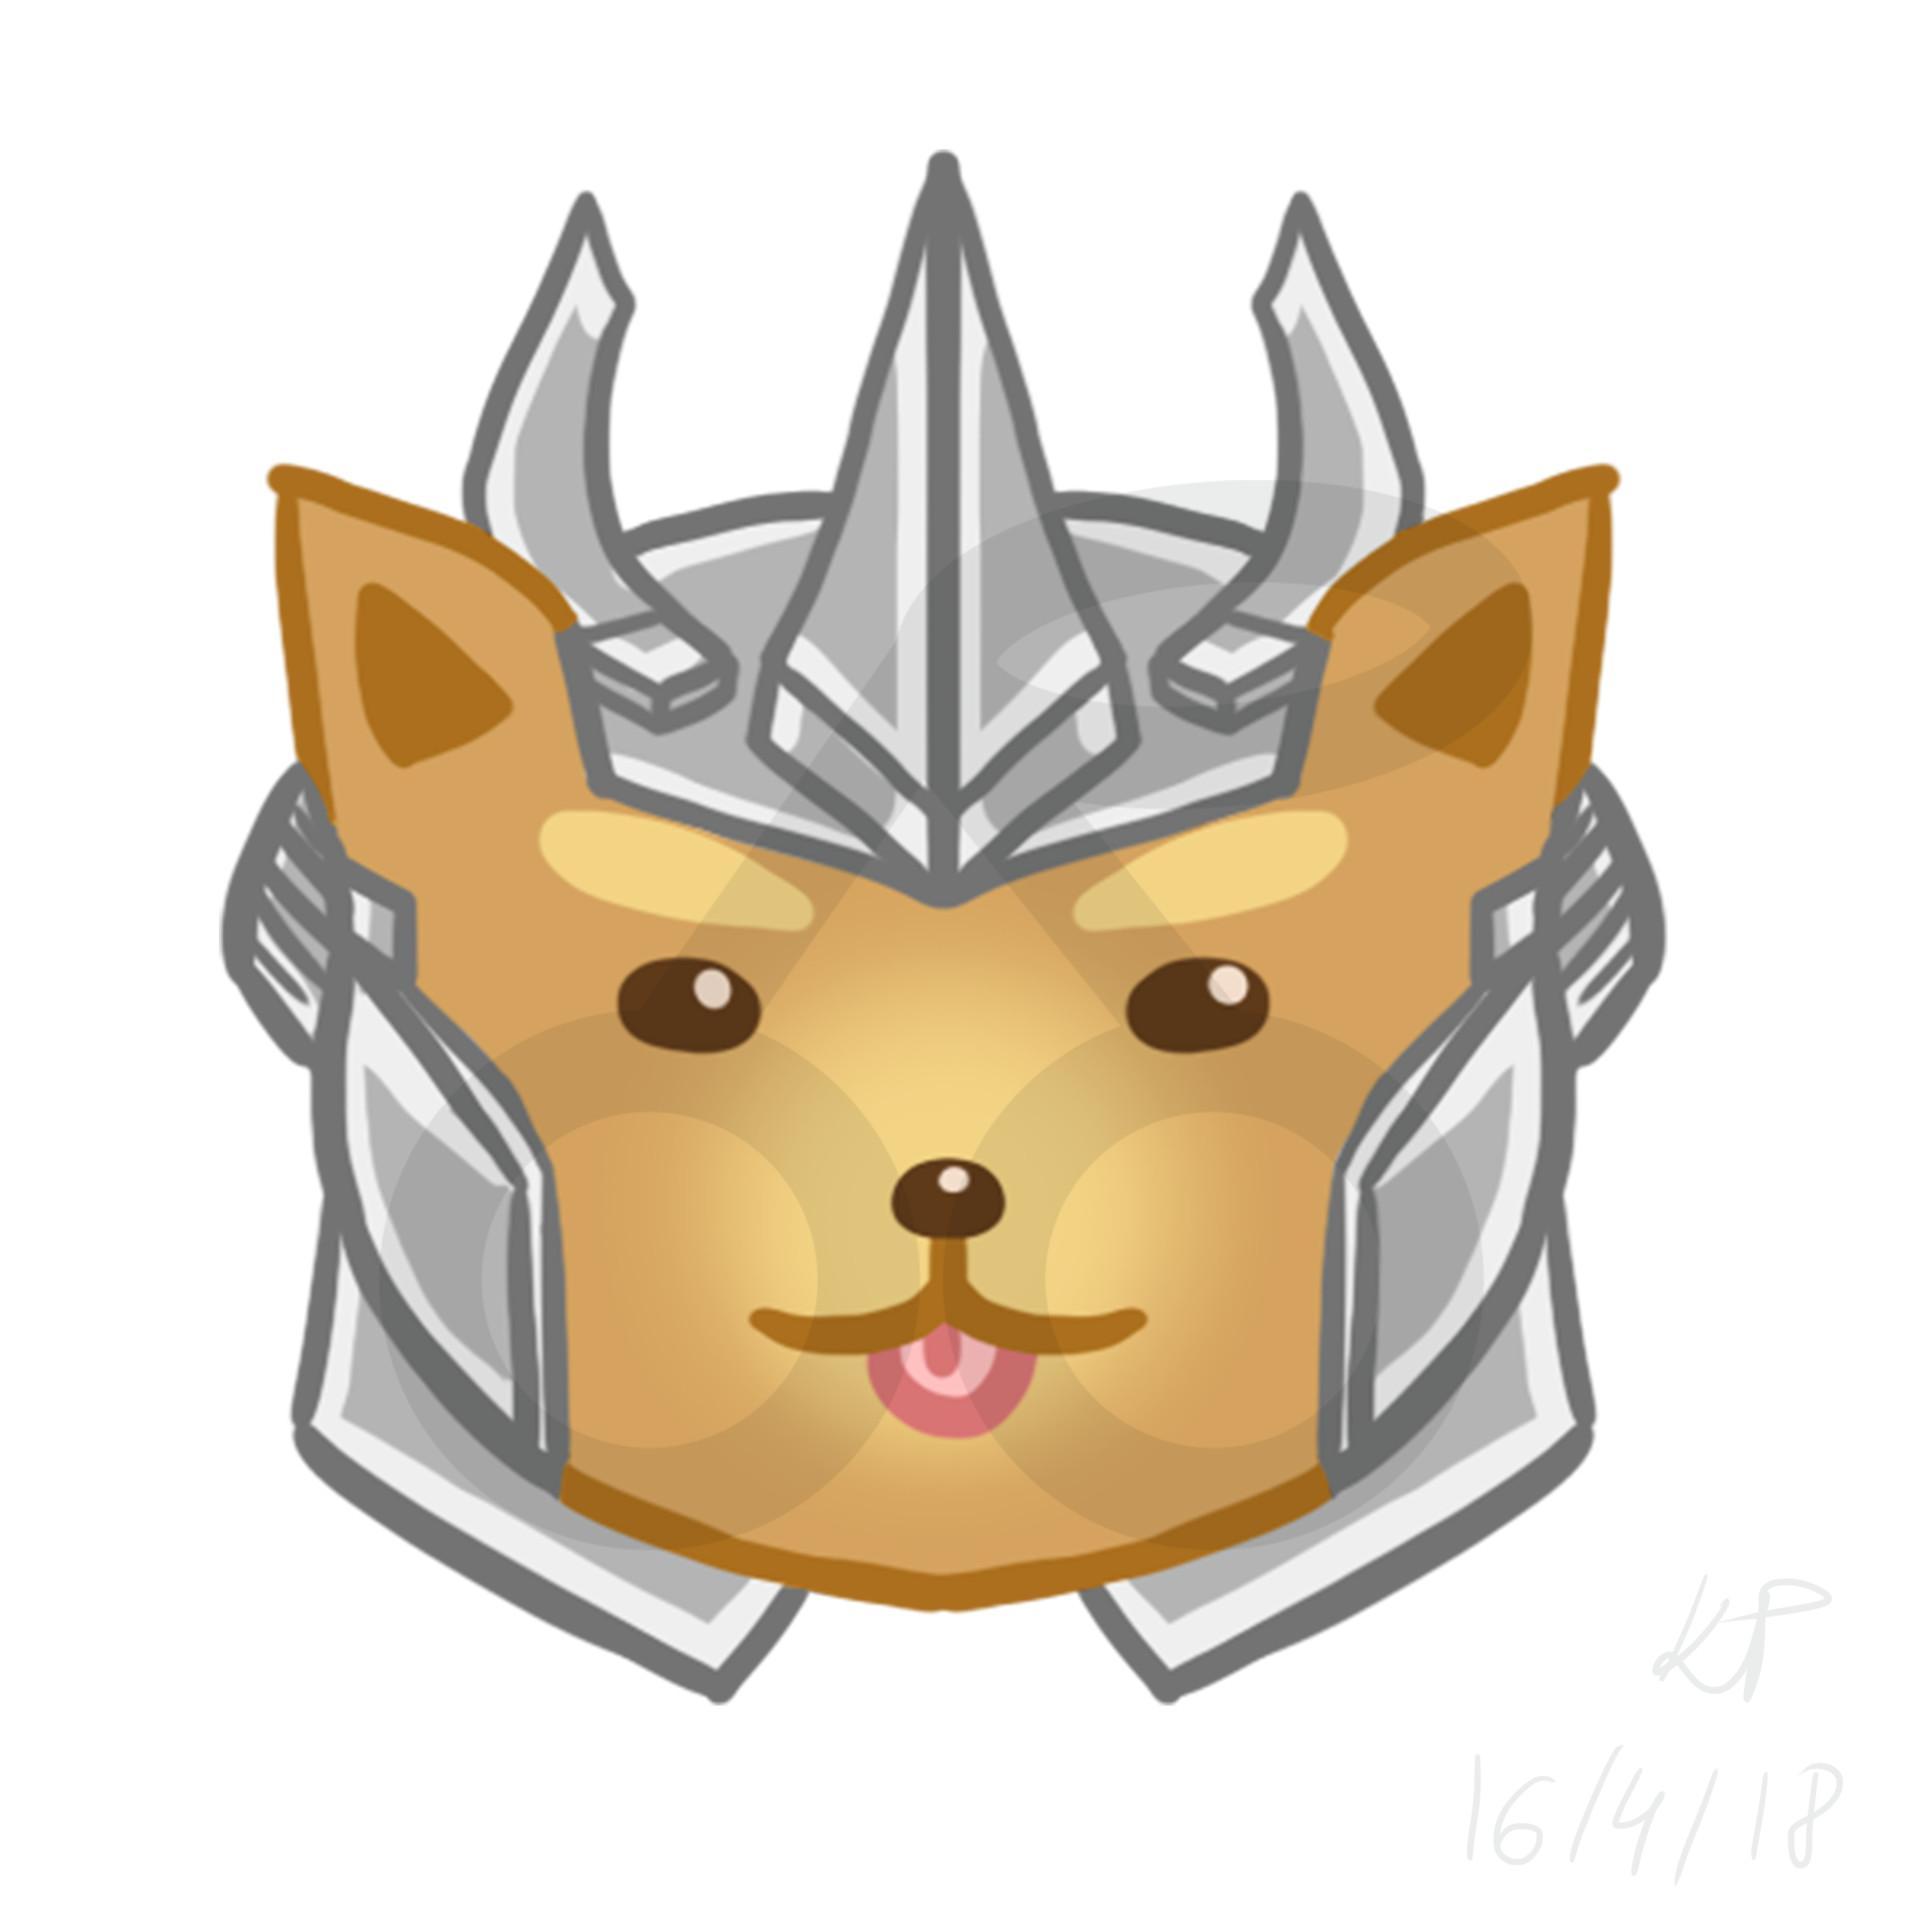 Katja Podjed - Emotes made for Twitch Streamer